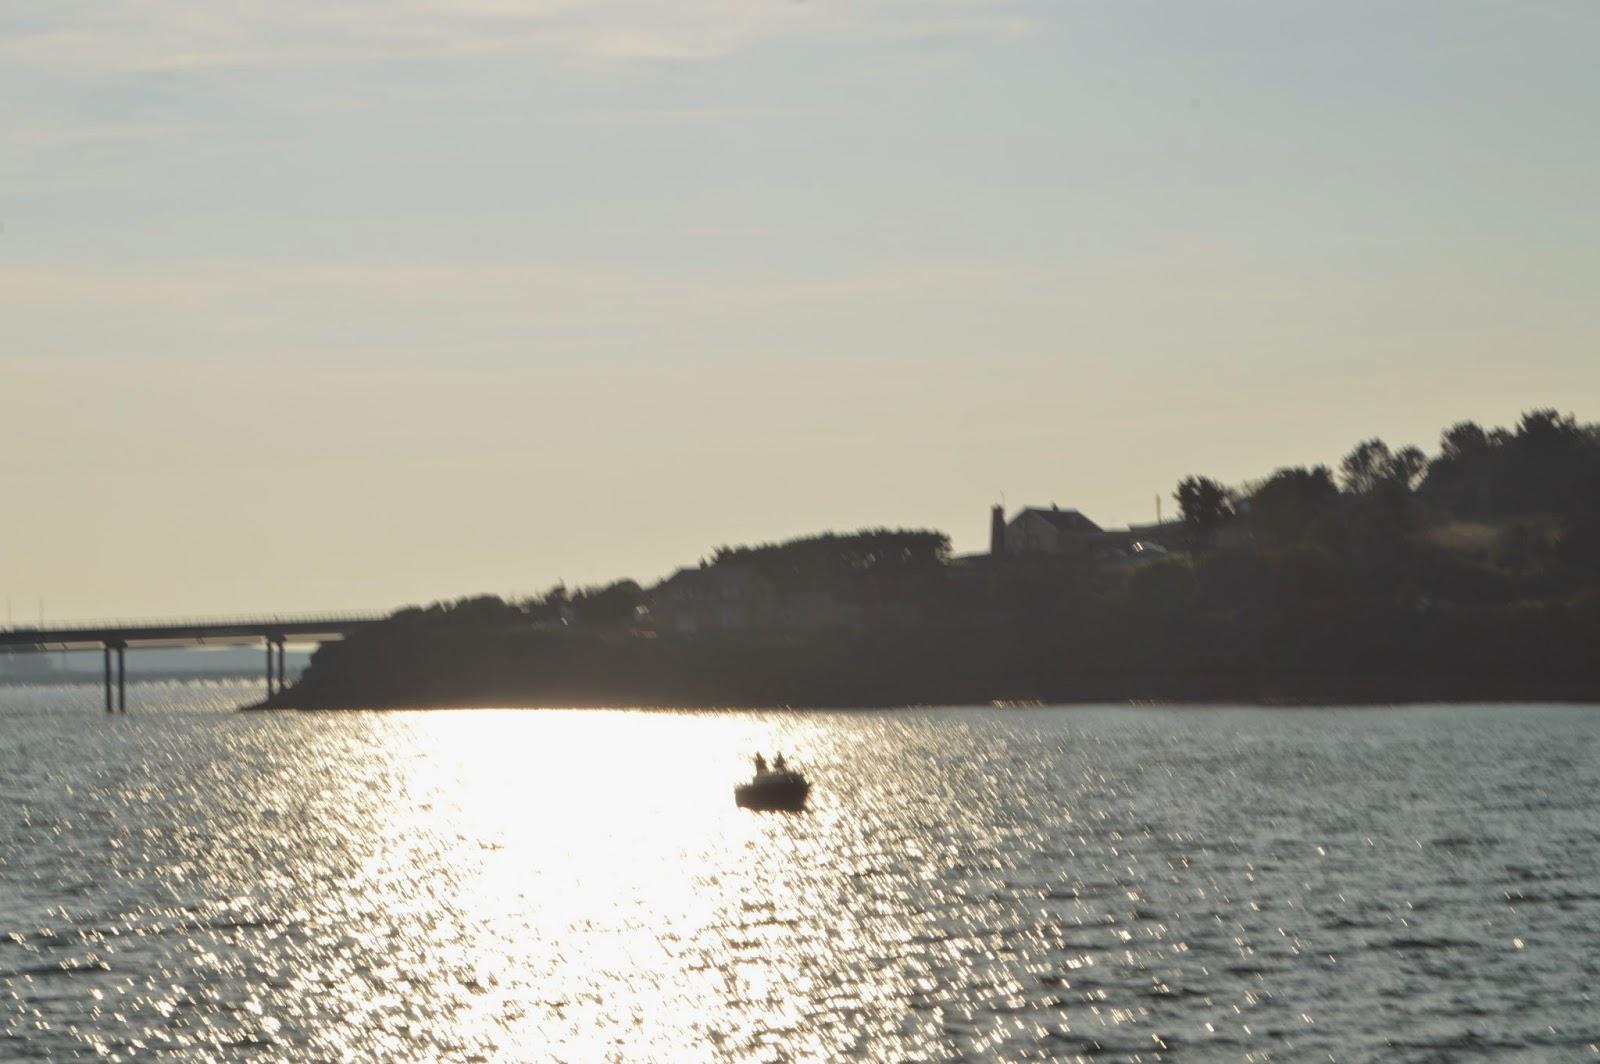 Gelliswick, Hakin, Pembrokeshire, sea, beach, boat, adventure, family fun